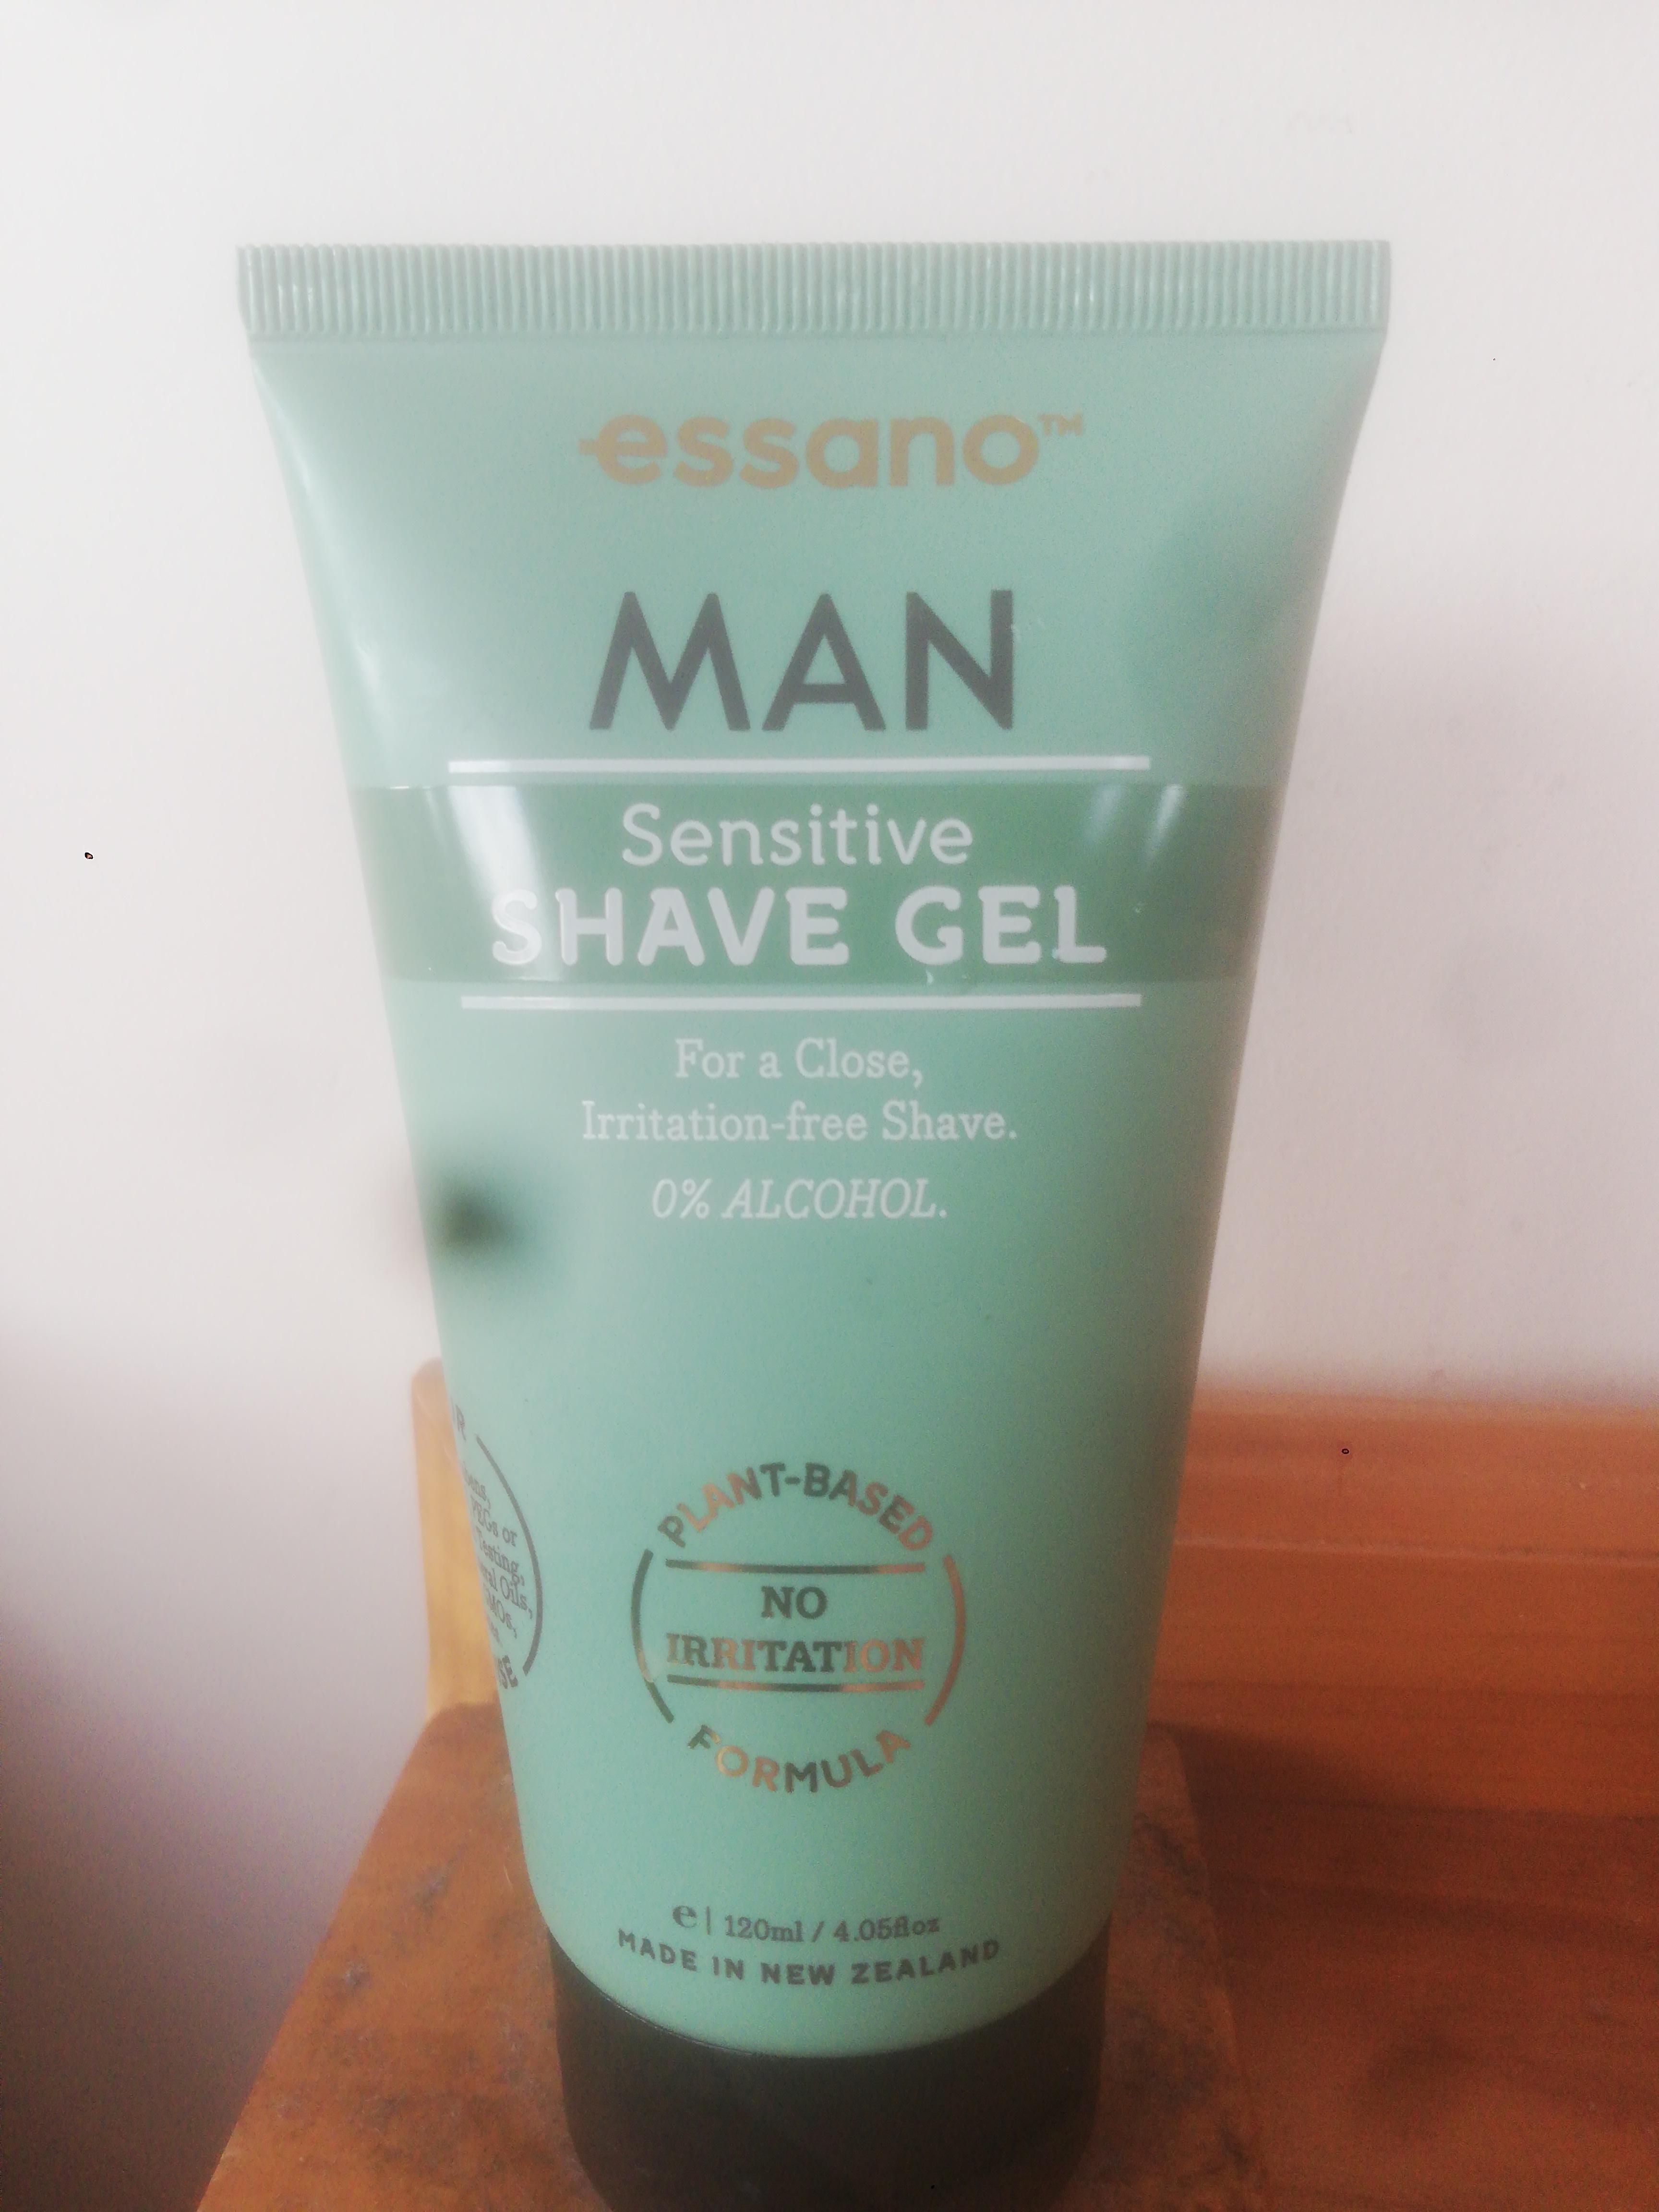 Essano Sensitive Shave Gel